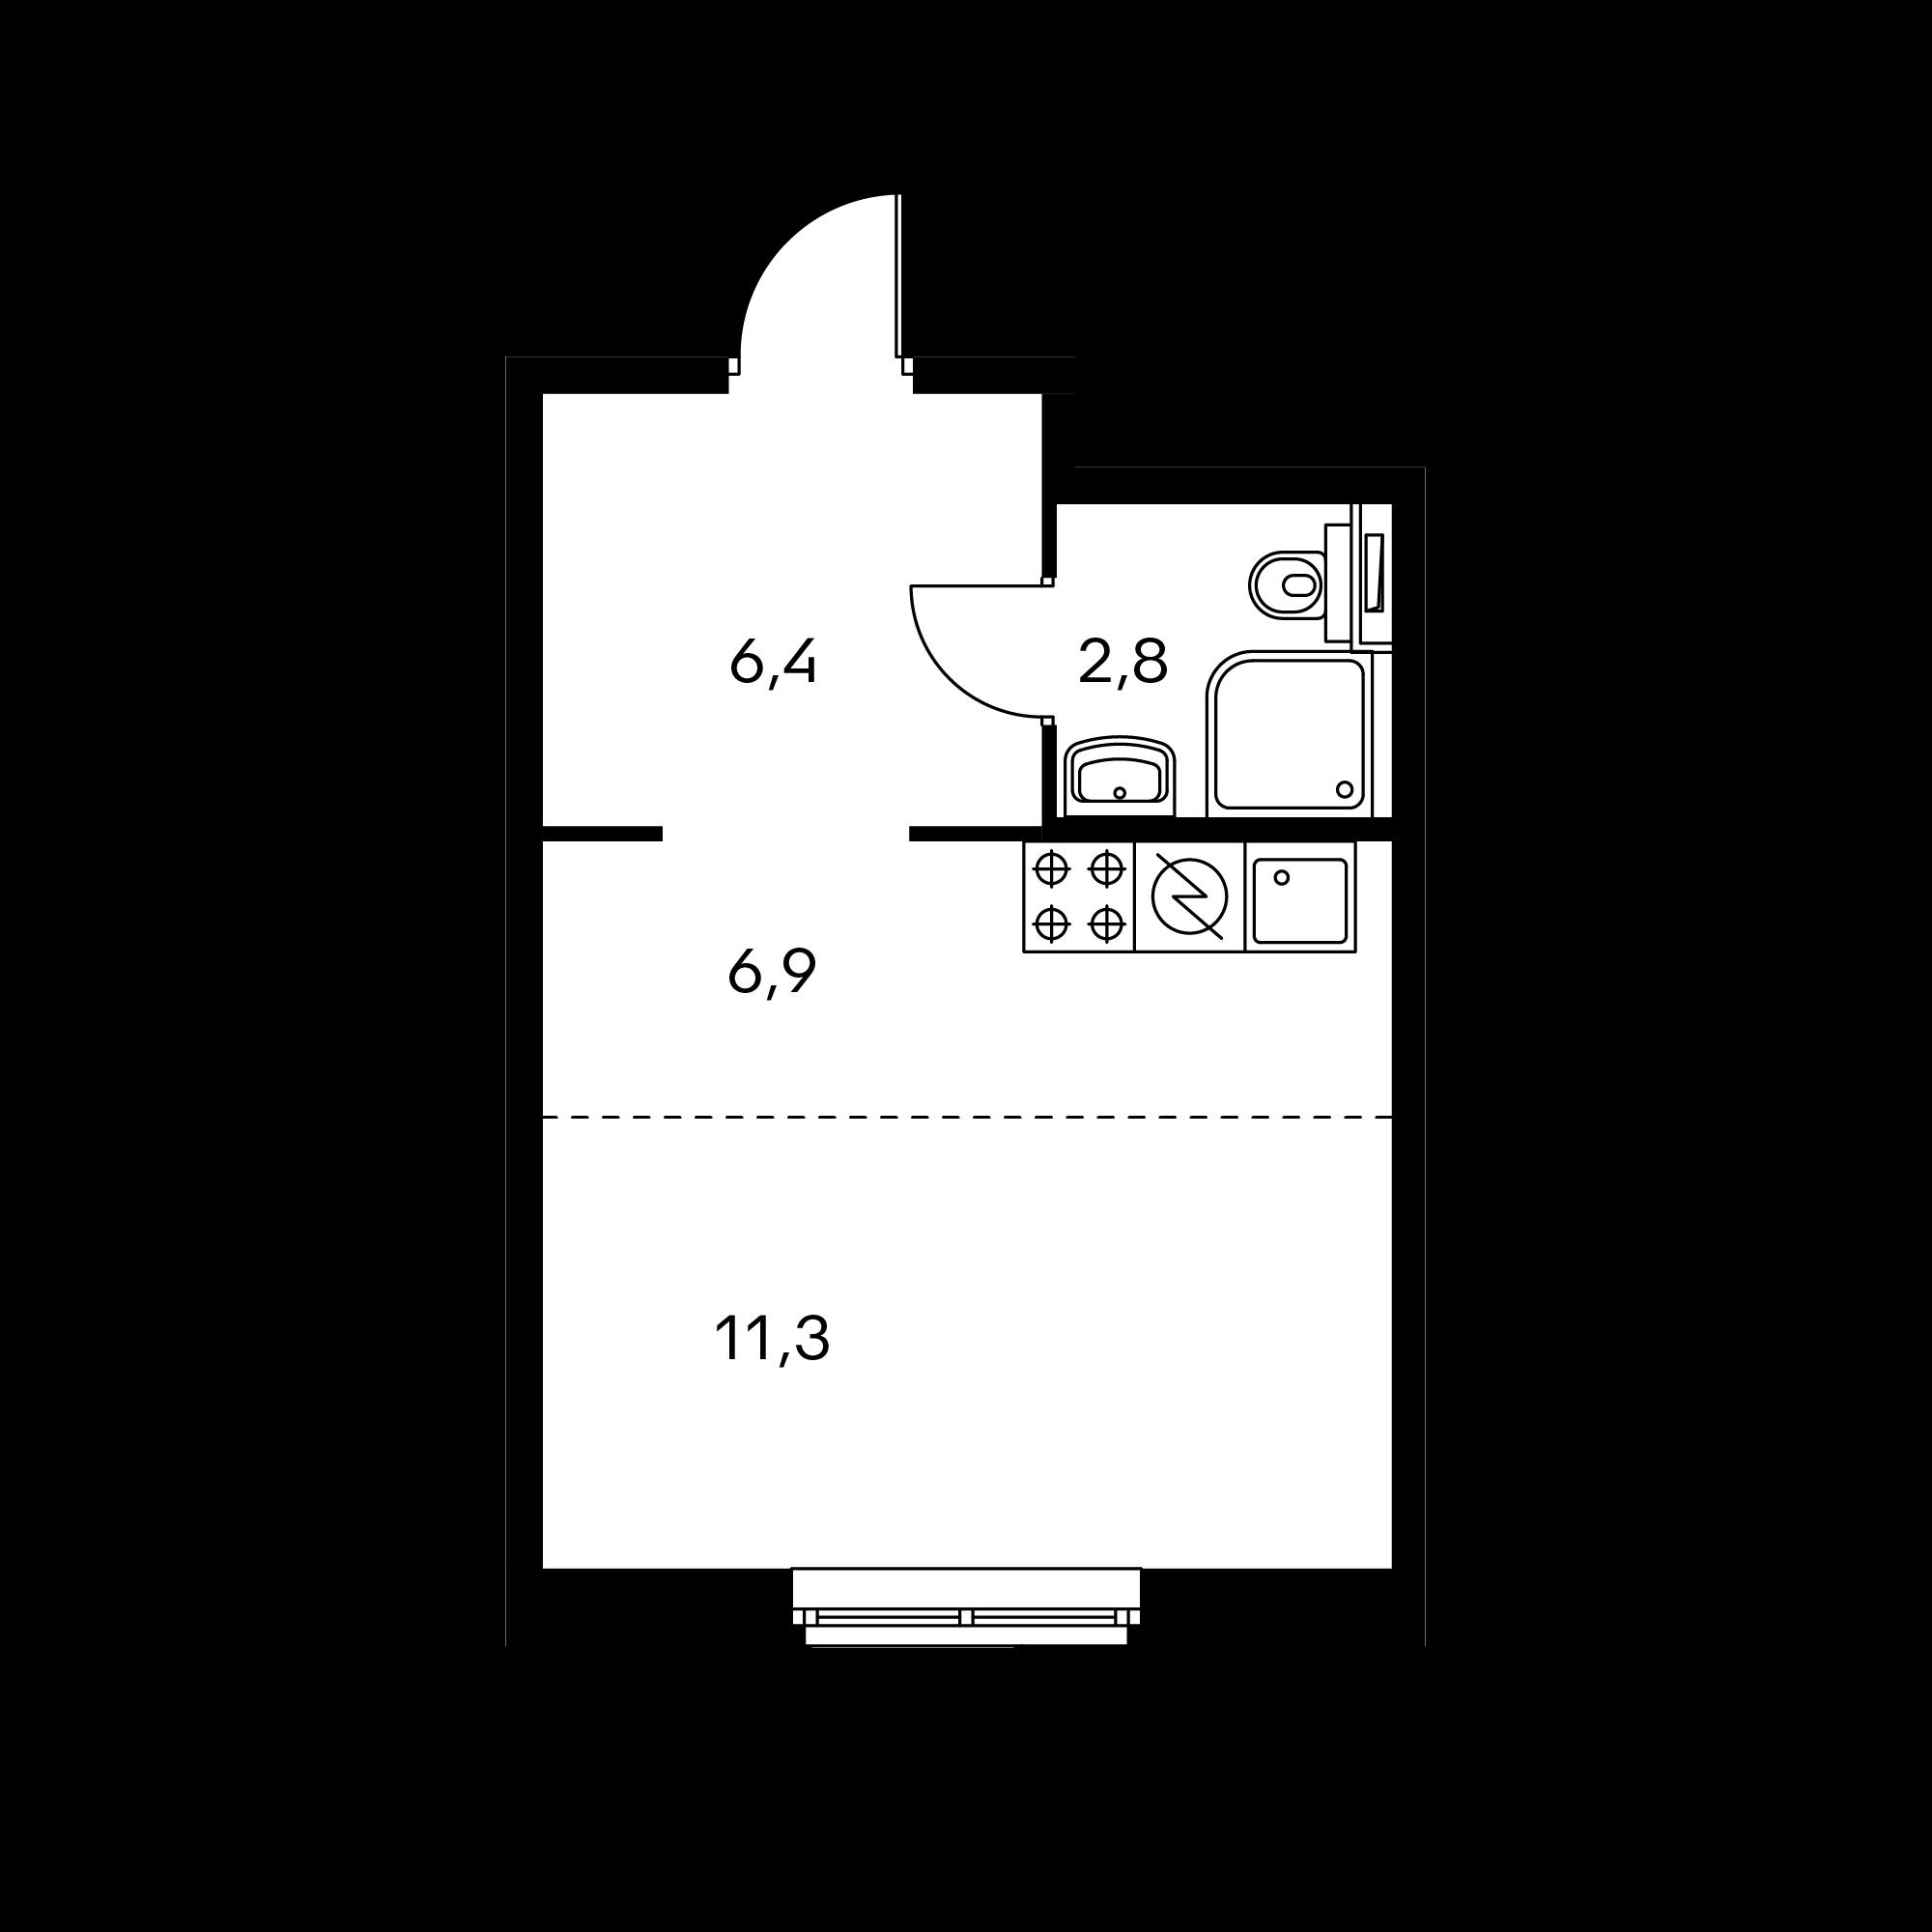 1NM1_4.8-2